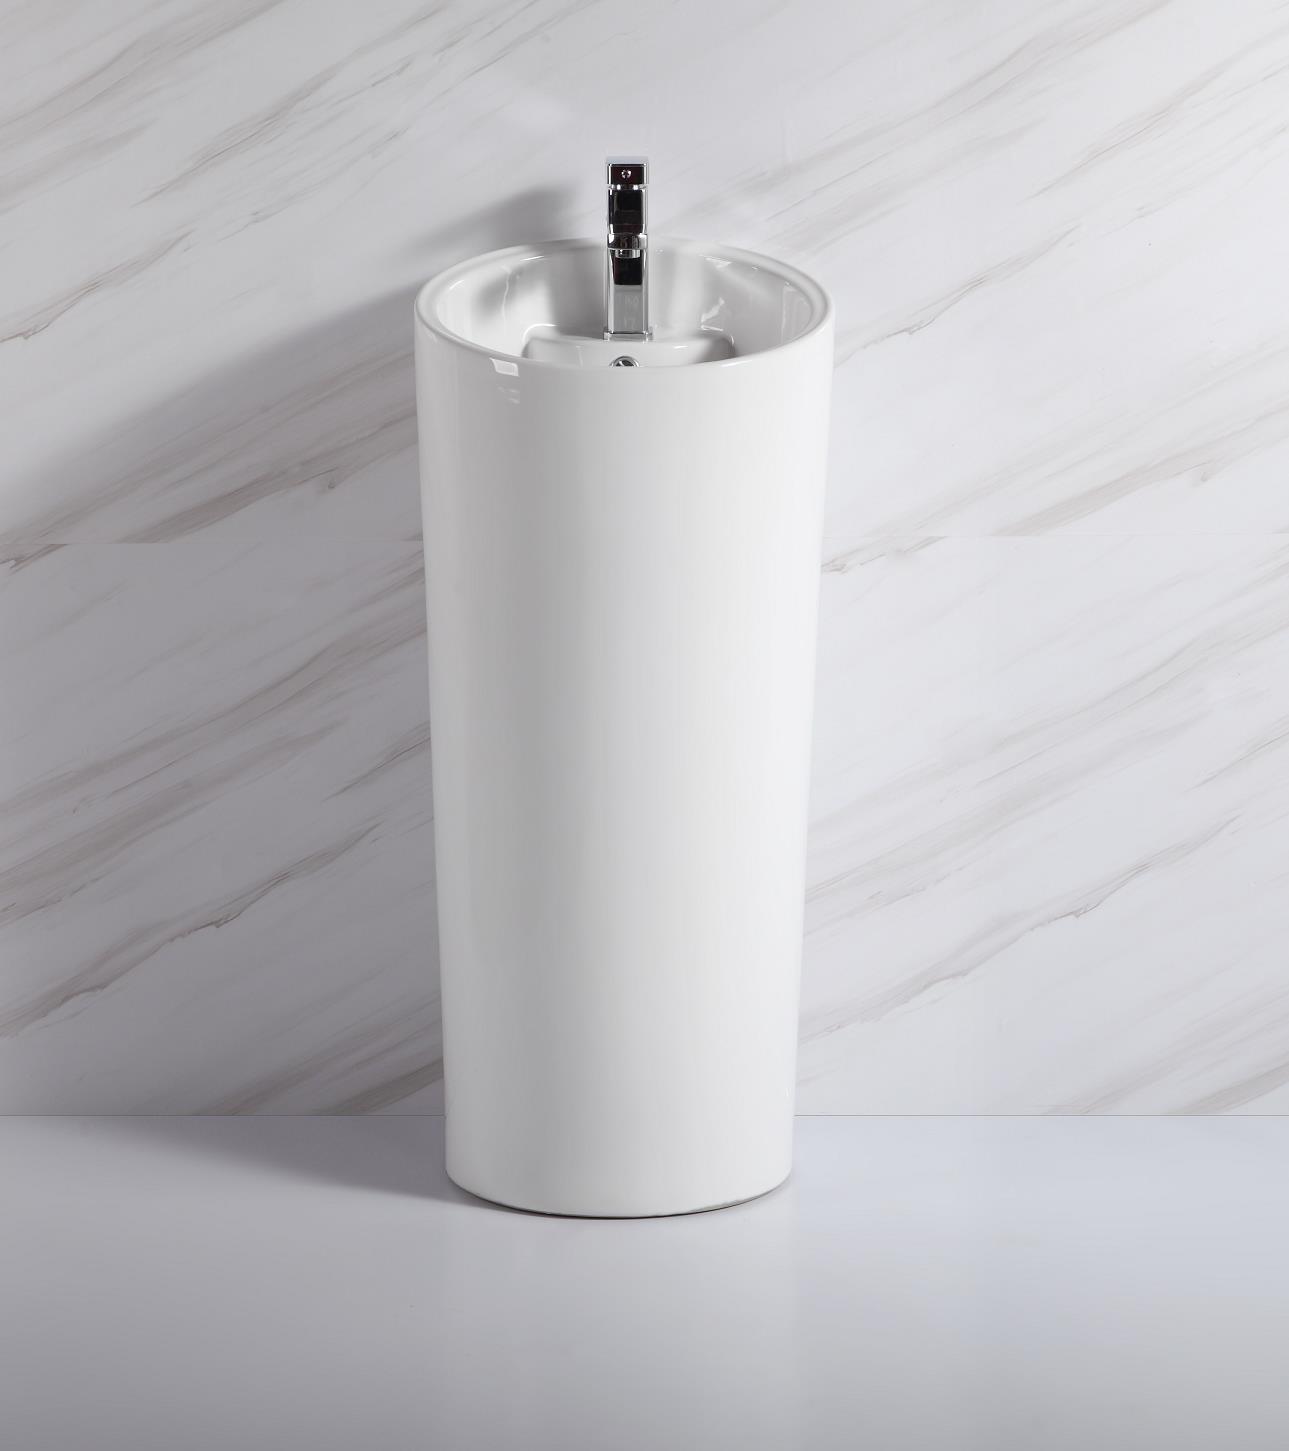 1125 factory direct cheap color black pedestal basin standing bathroom wash sink